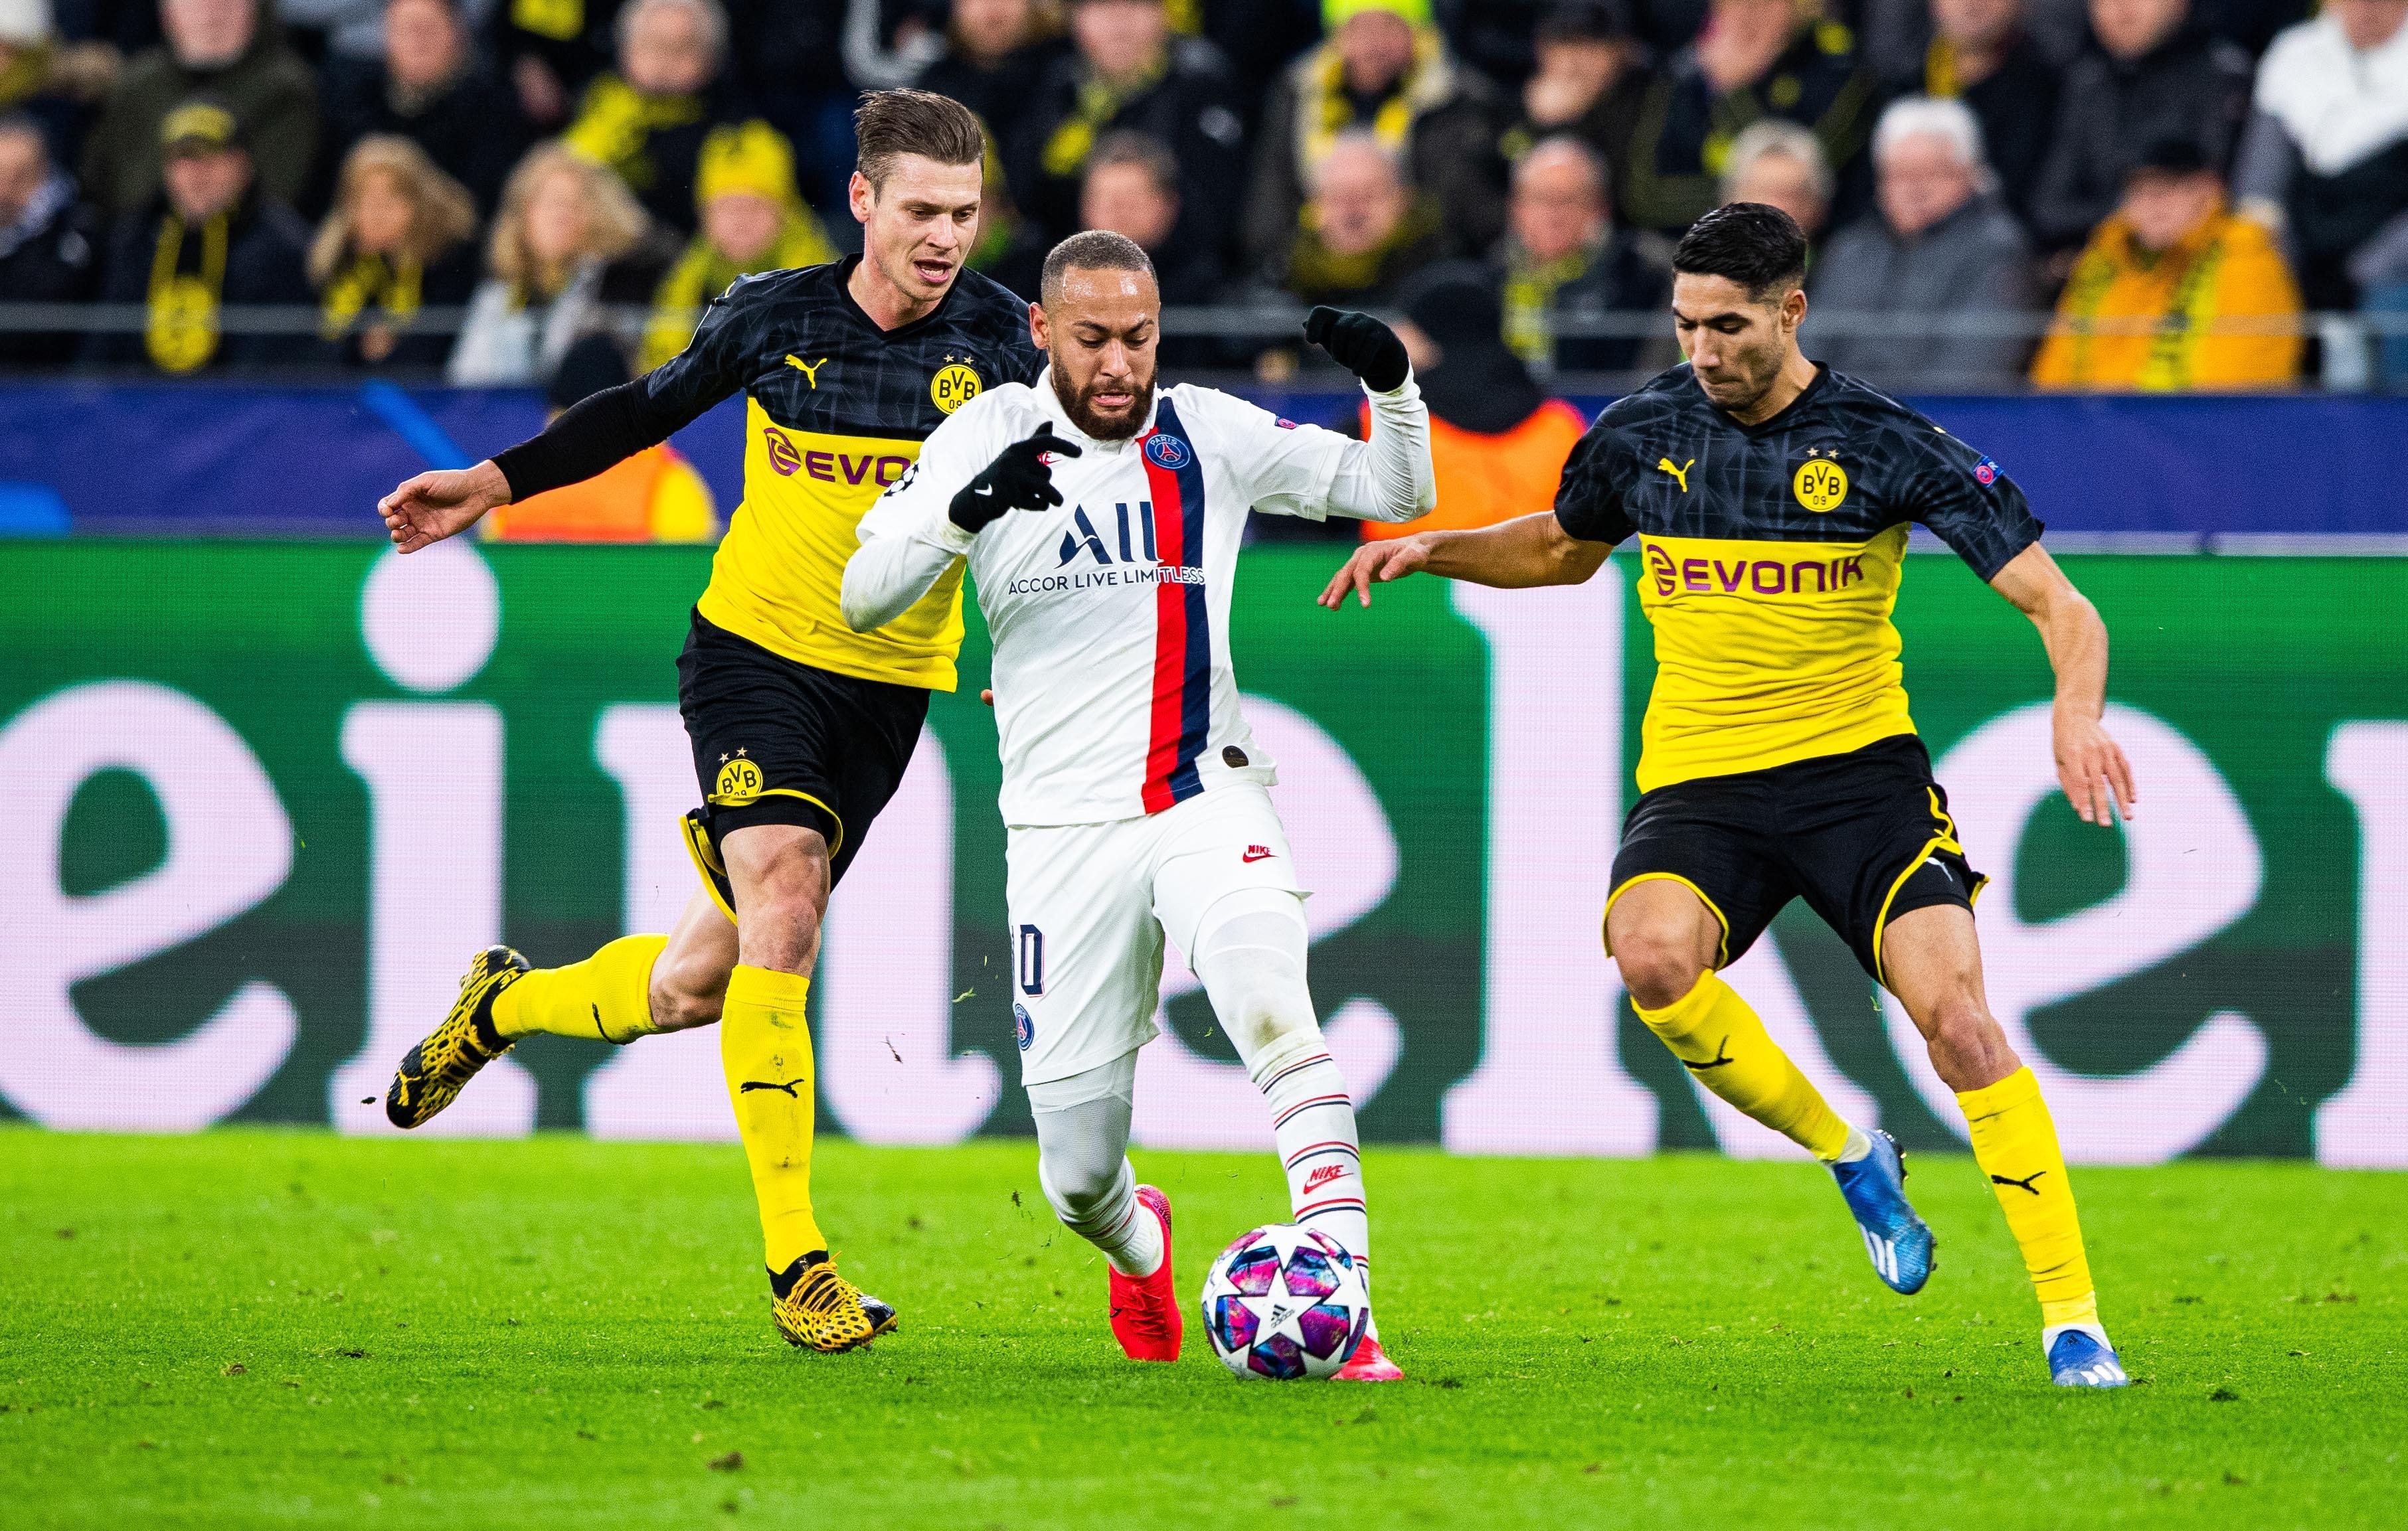 Psg Dortmund RГјckspiel